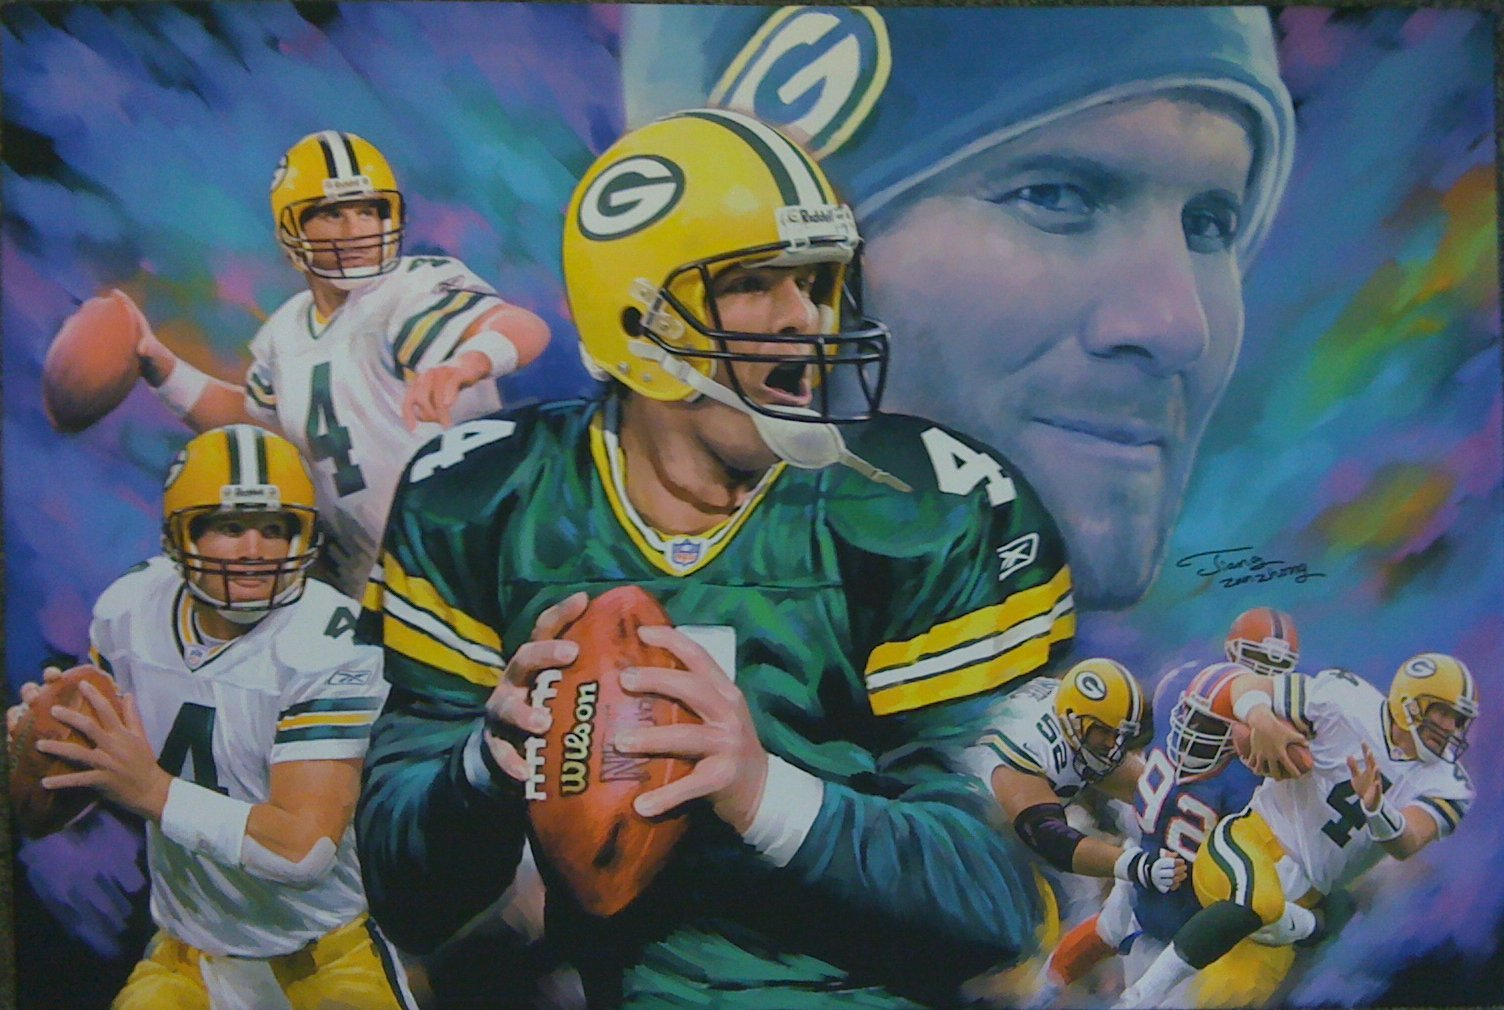 Brett Favre talks Hall of Fame enshrinement, Johnny Manziel & Super Bowl 50